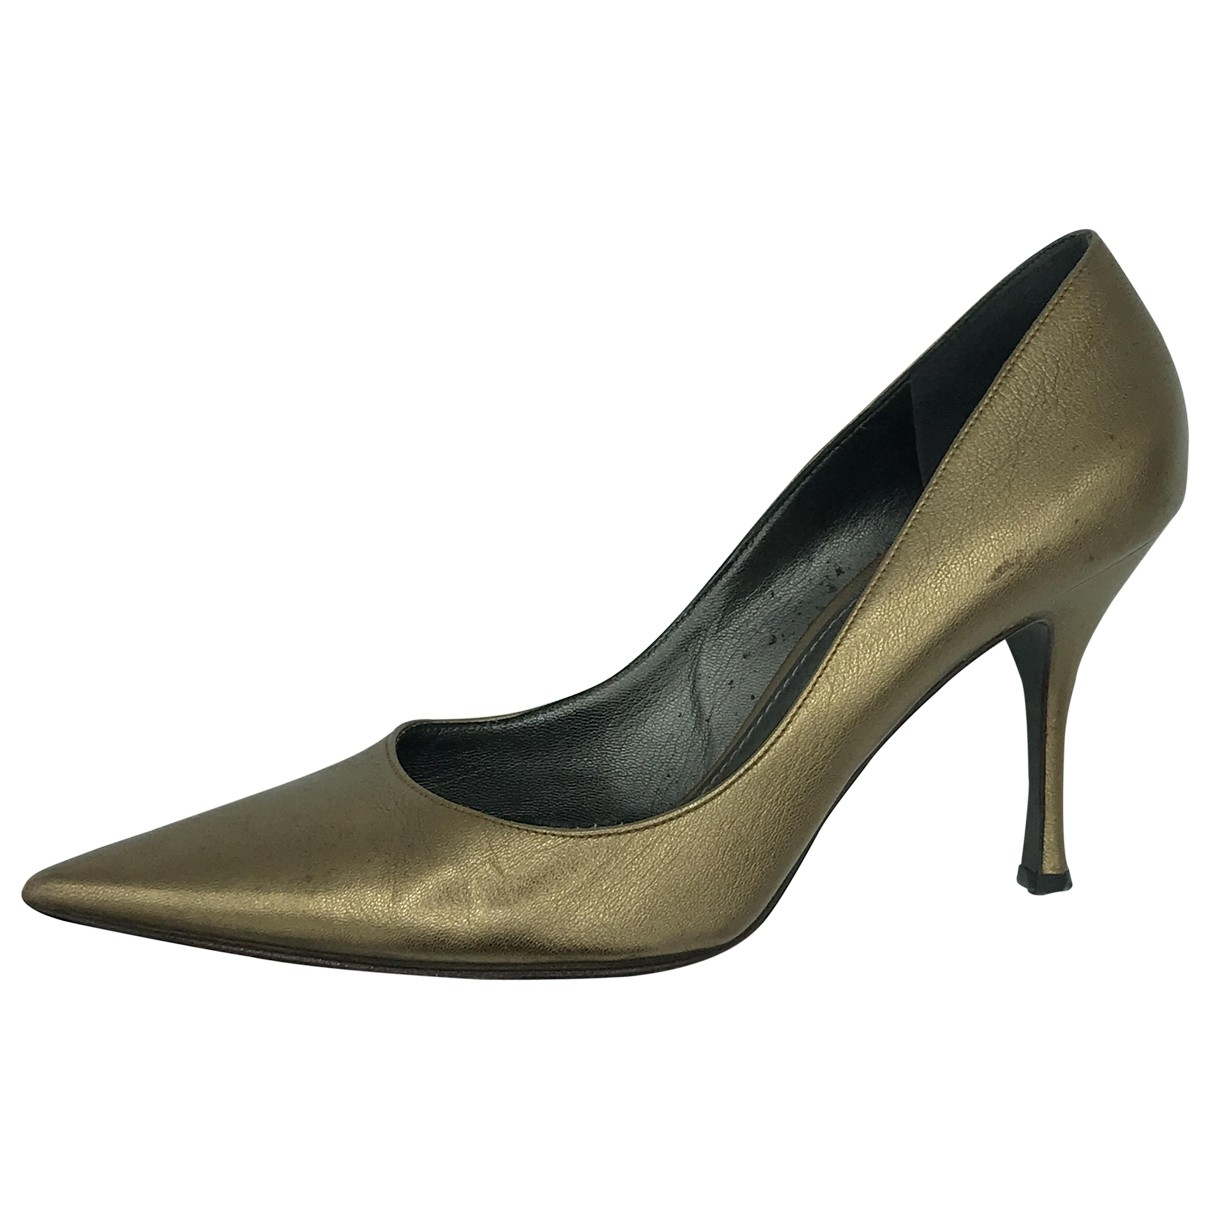 Dolce & Gabbana \N Metallic Leather Heels for Women 39.5 EU